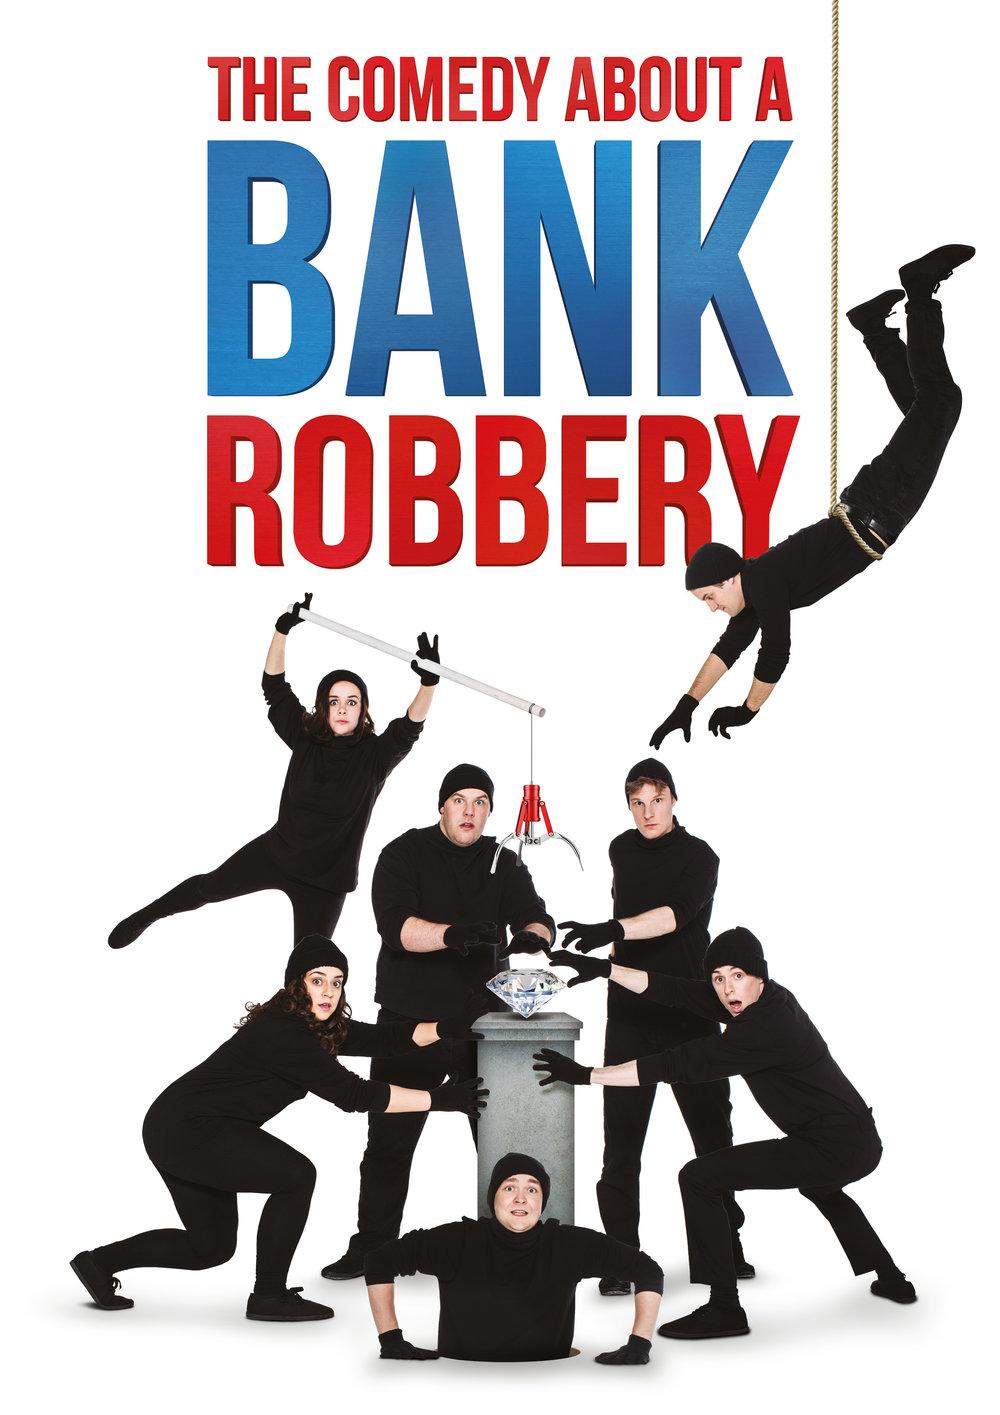 BANK16014_Images_for_Publishers.jpg